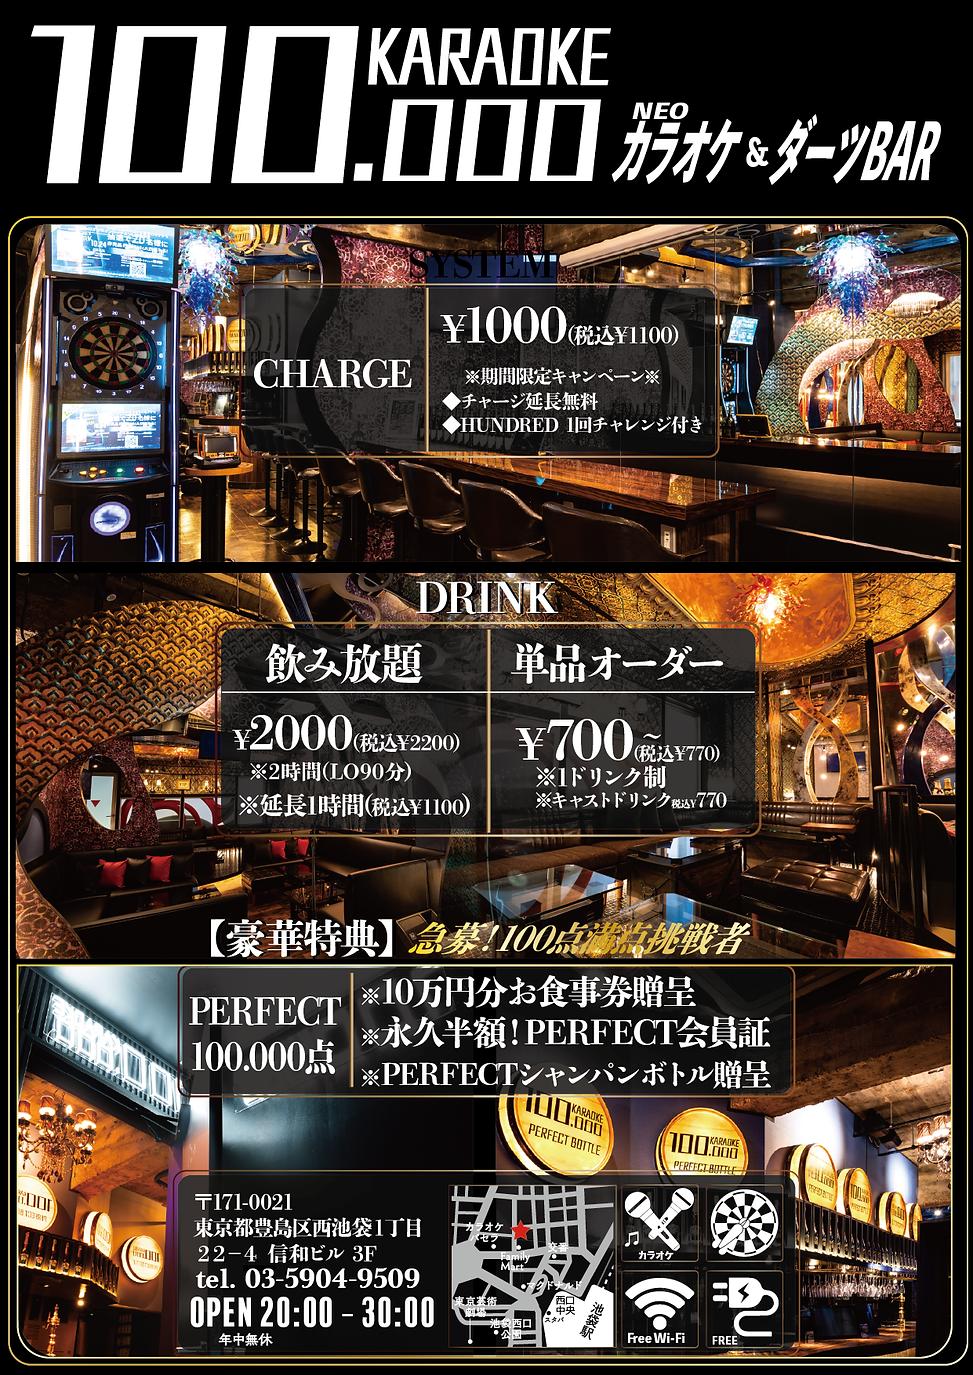 A4_KARAOKE HUNDRED_menu_アサヒ-11.png